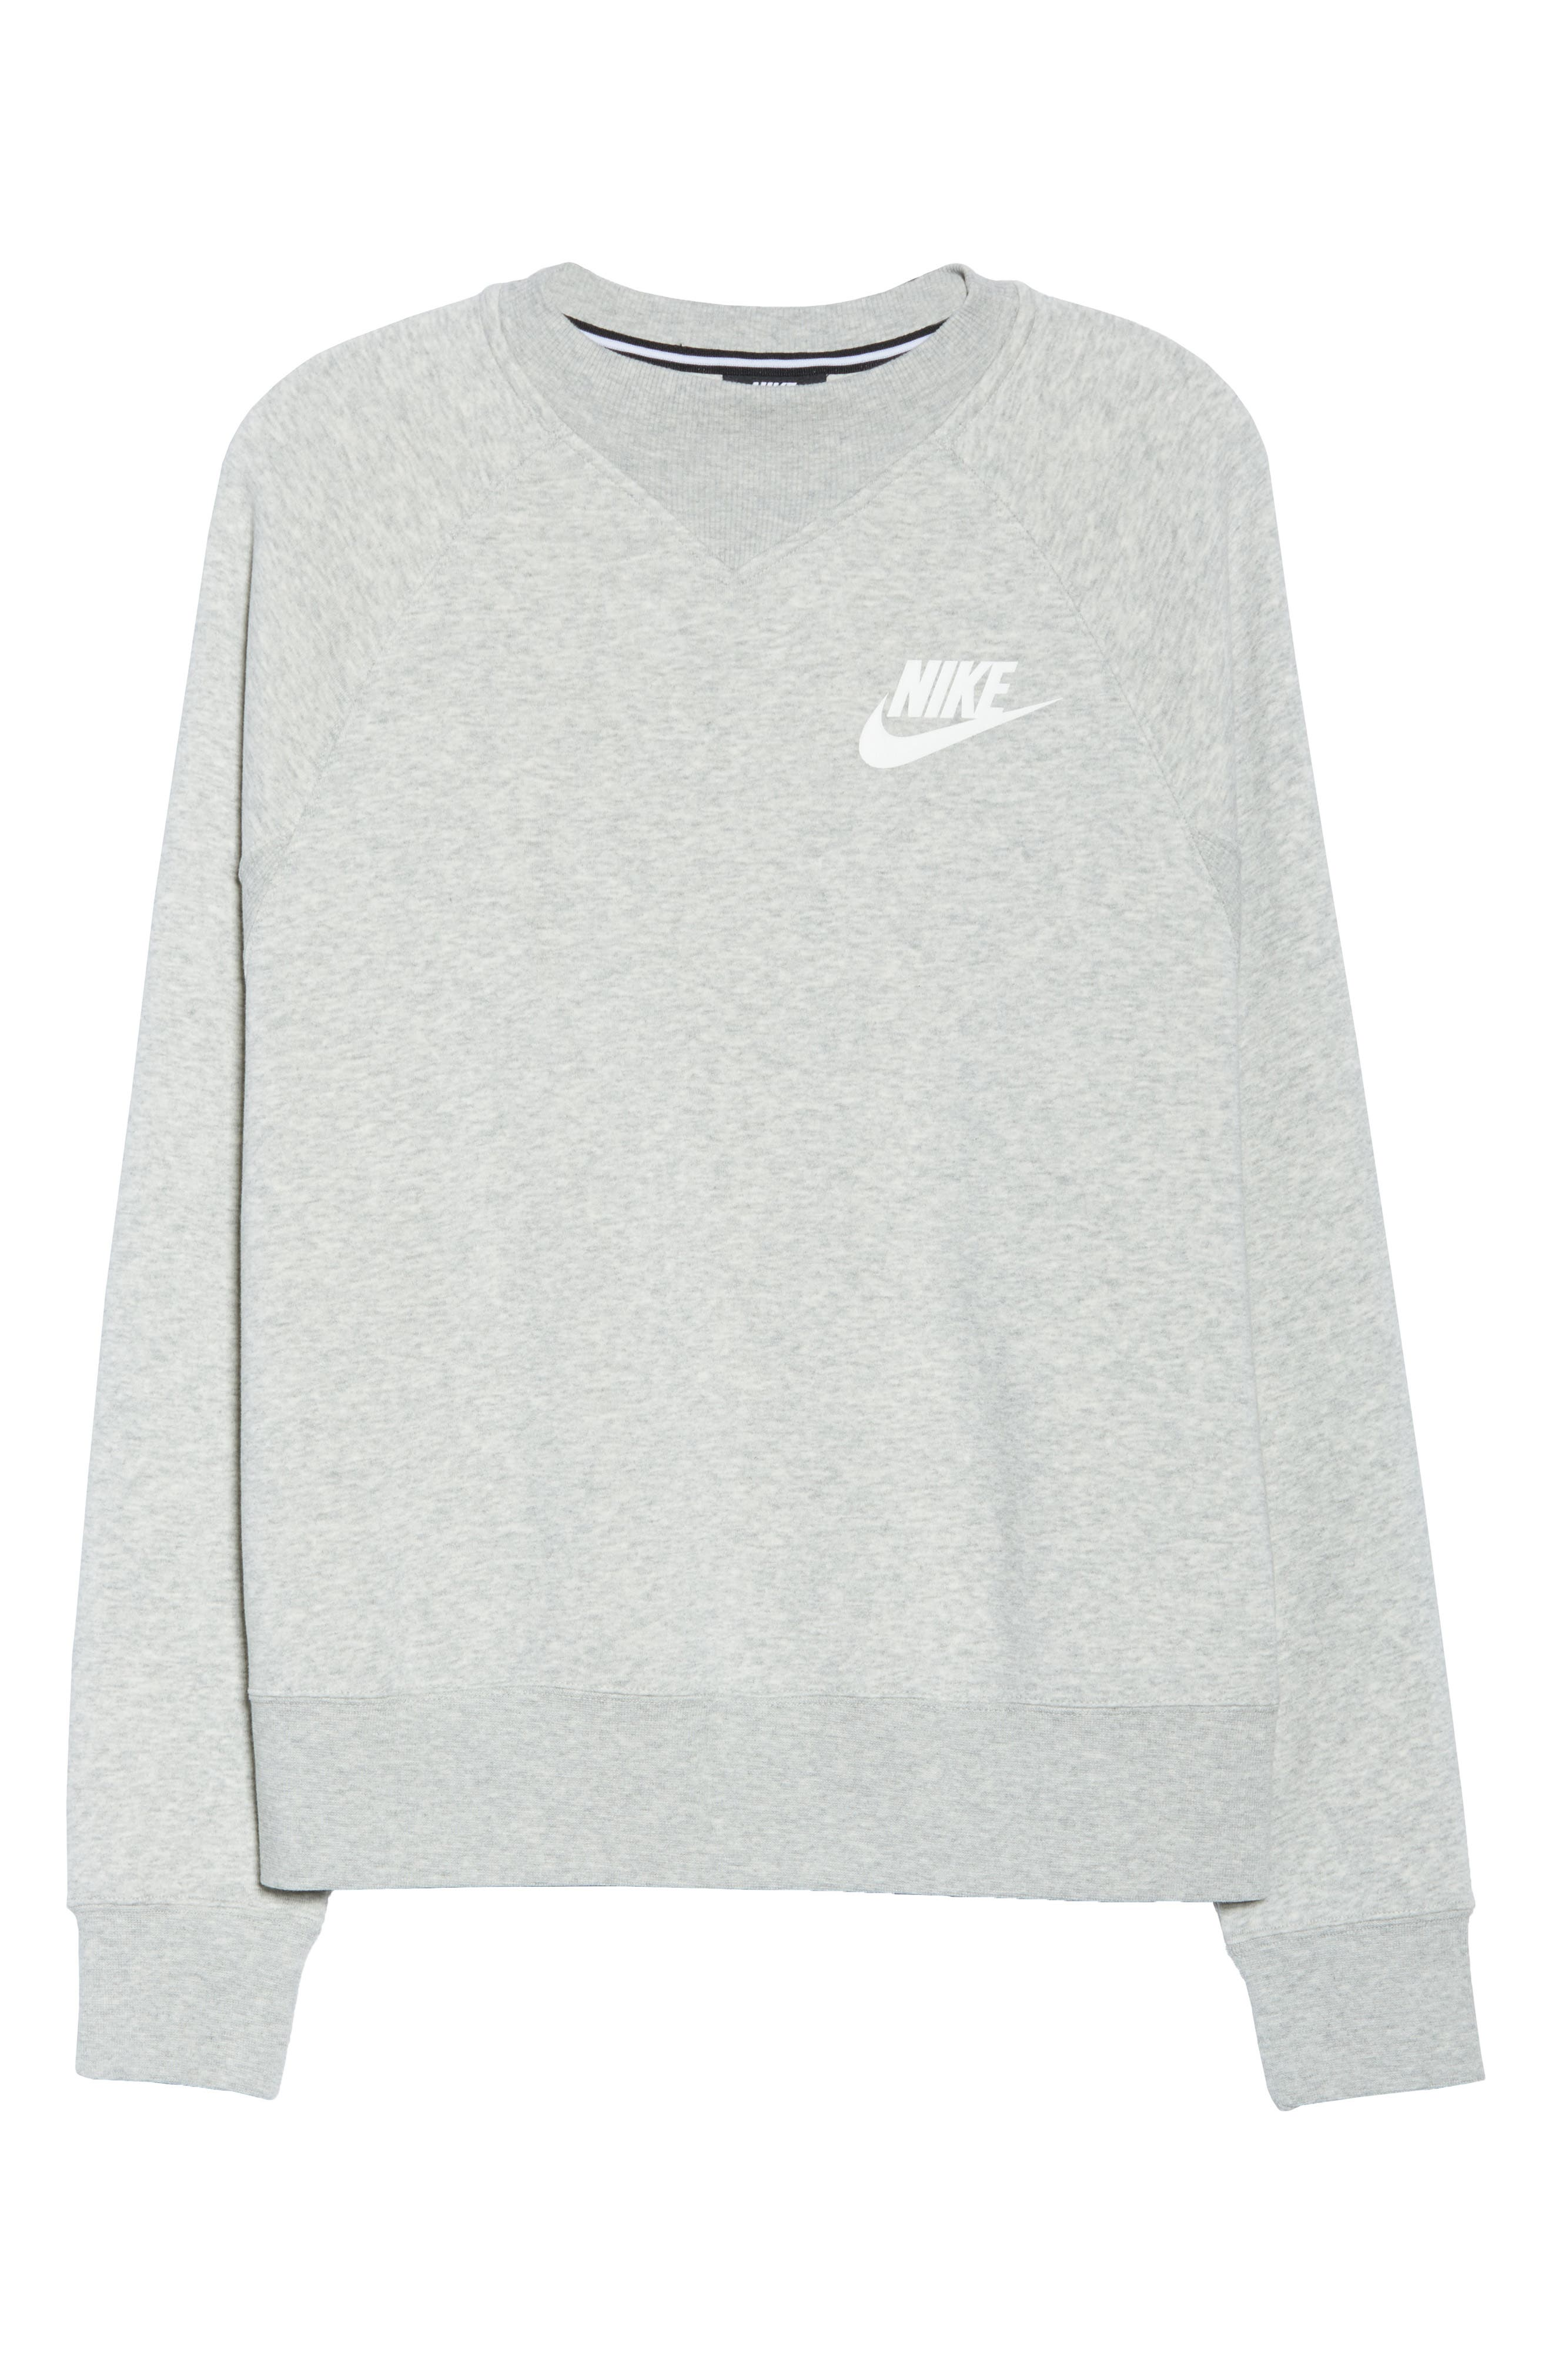 Sportswear Rally Sweatshirt,                             Alternate thumbnail 7, color,                             GREY HEATHER/ WHITE